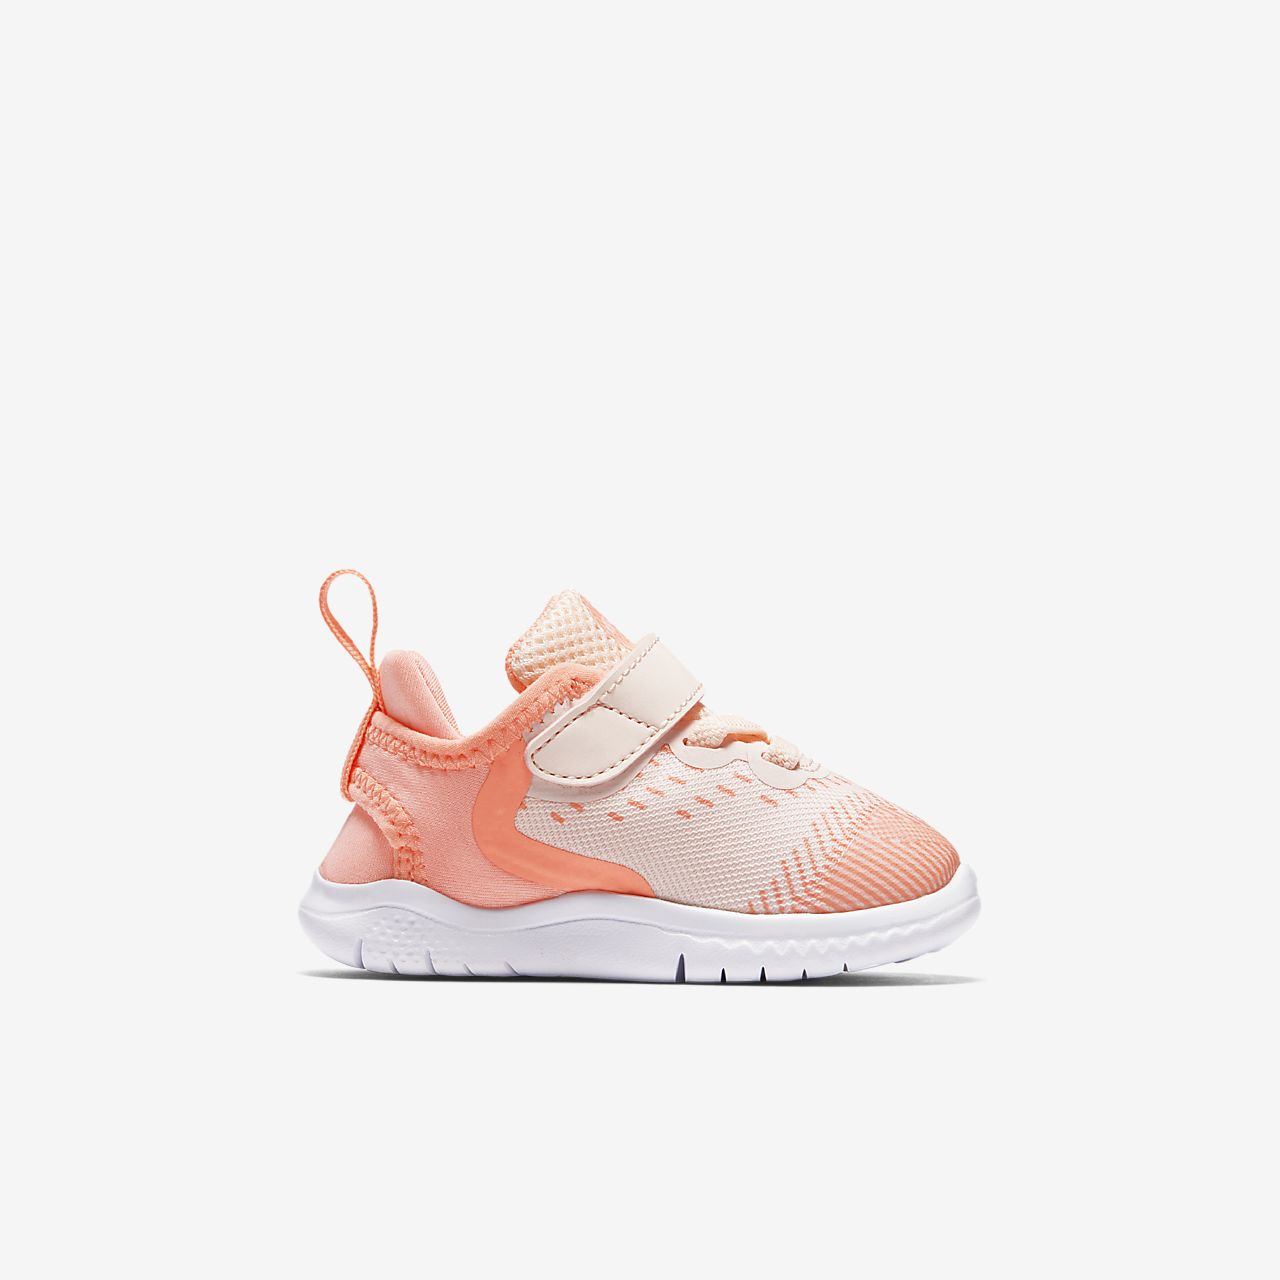 40a18087c4b5 Nike Free RN 2018 Baby  amp  Toddler Shoe. Nike.com CA